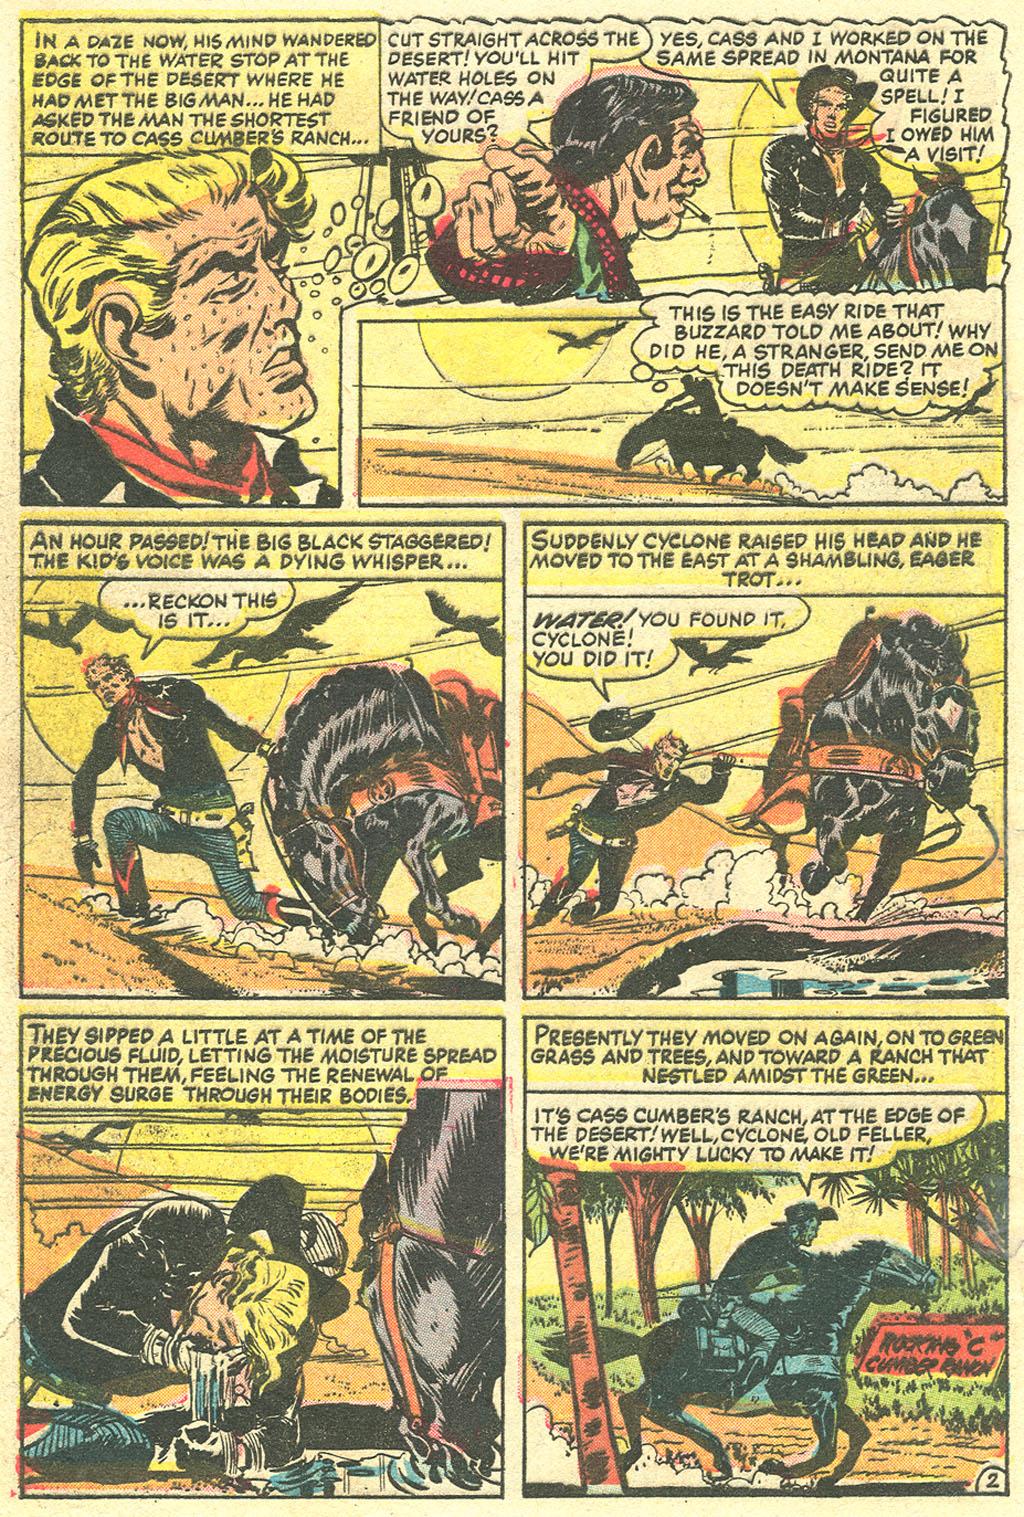 Read online Two-Gun Kid comic -  Issue #29 - 4